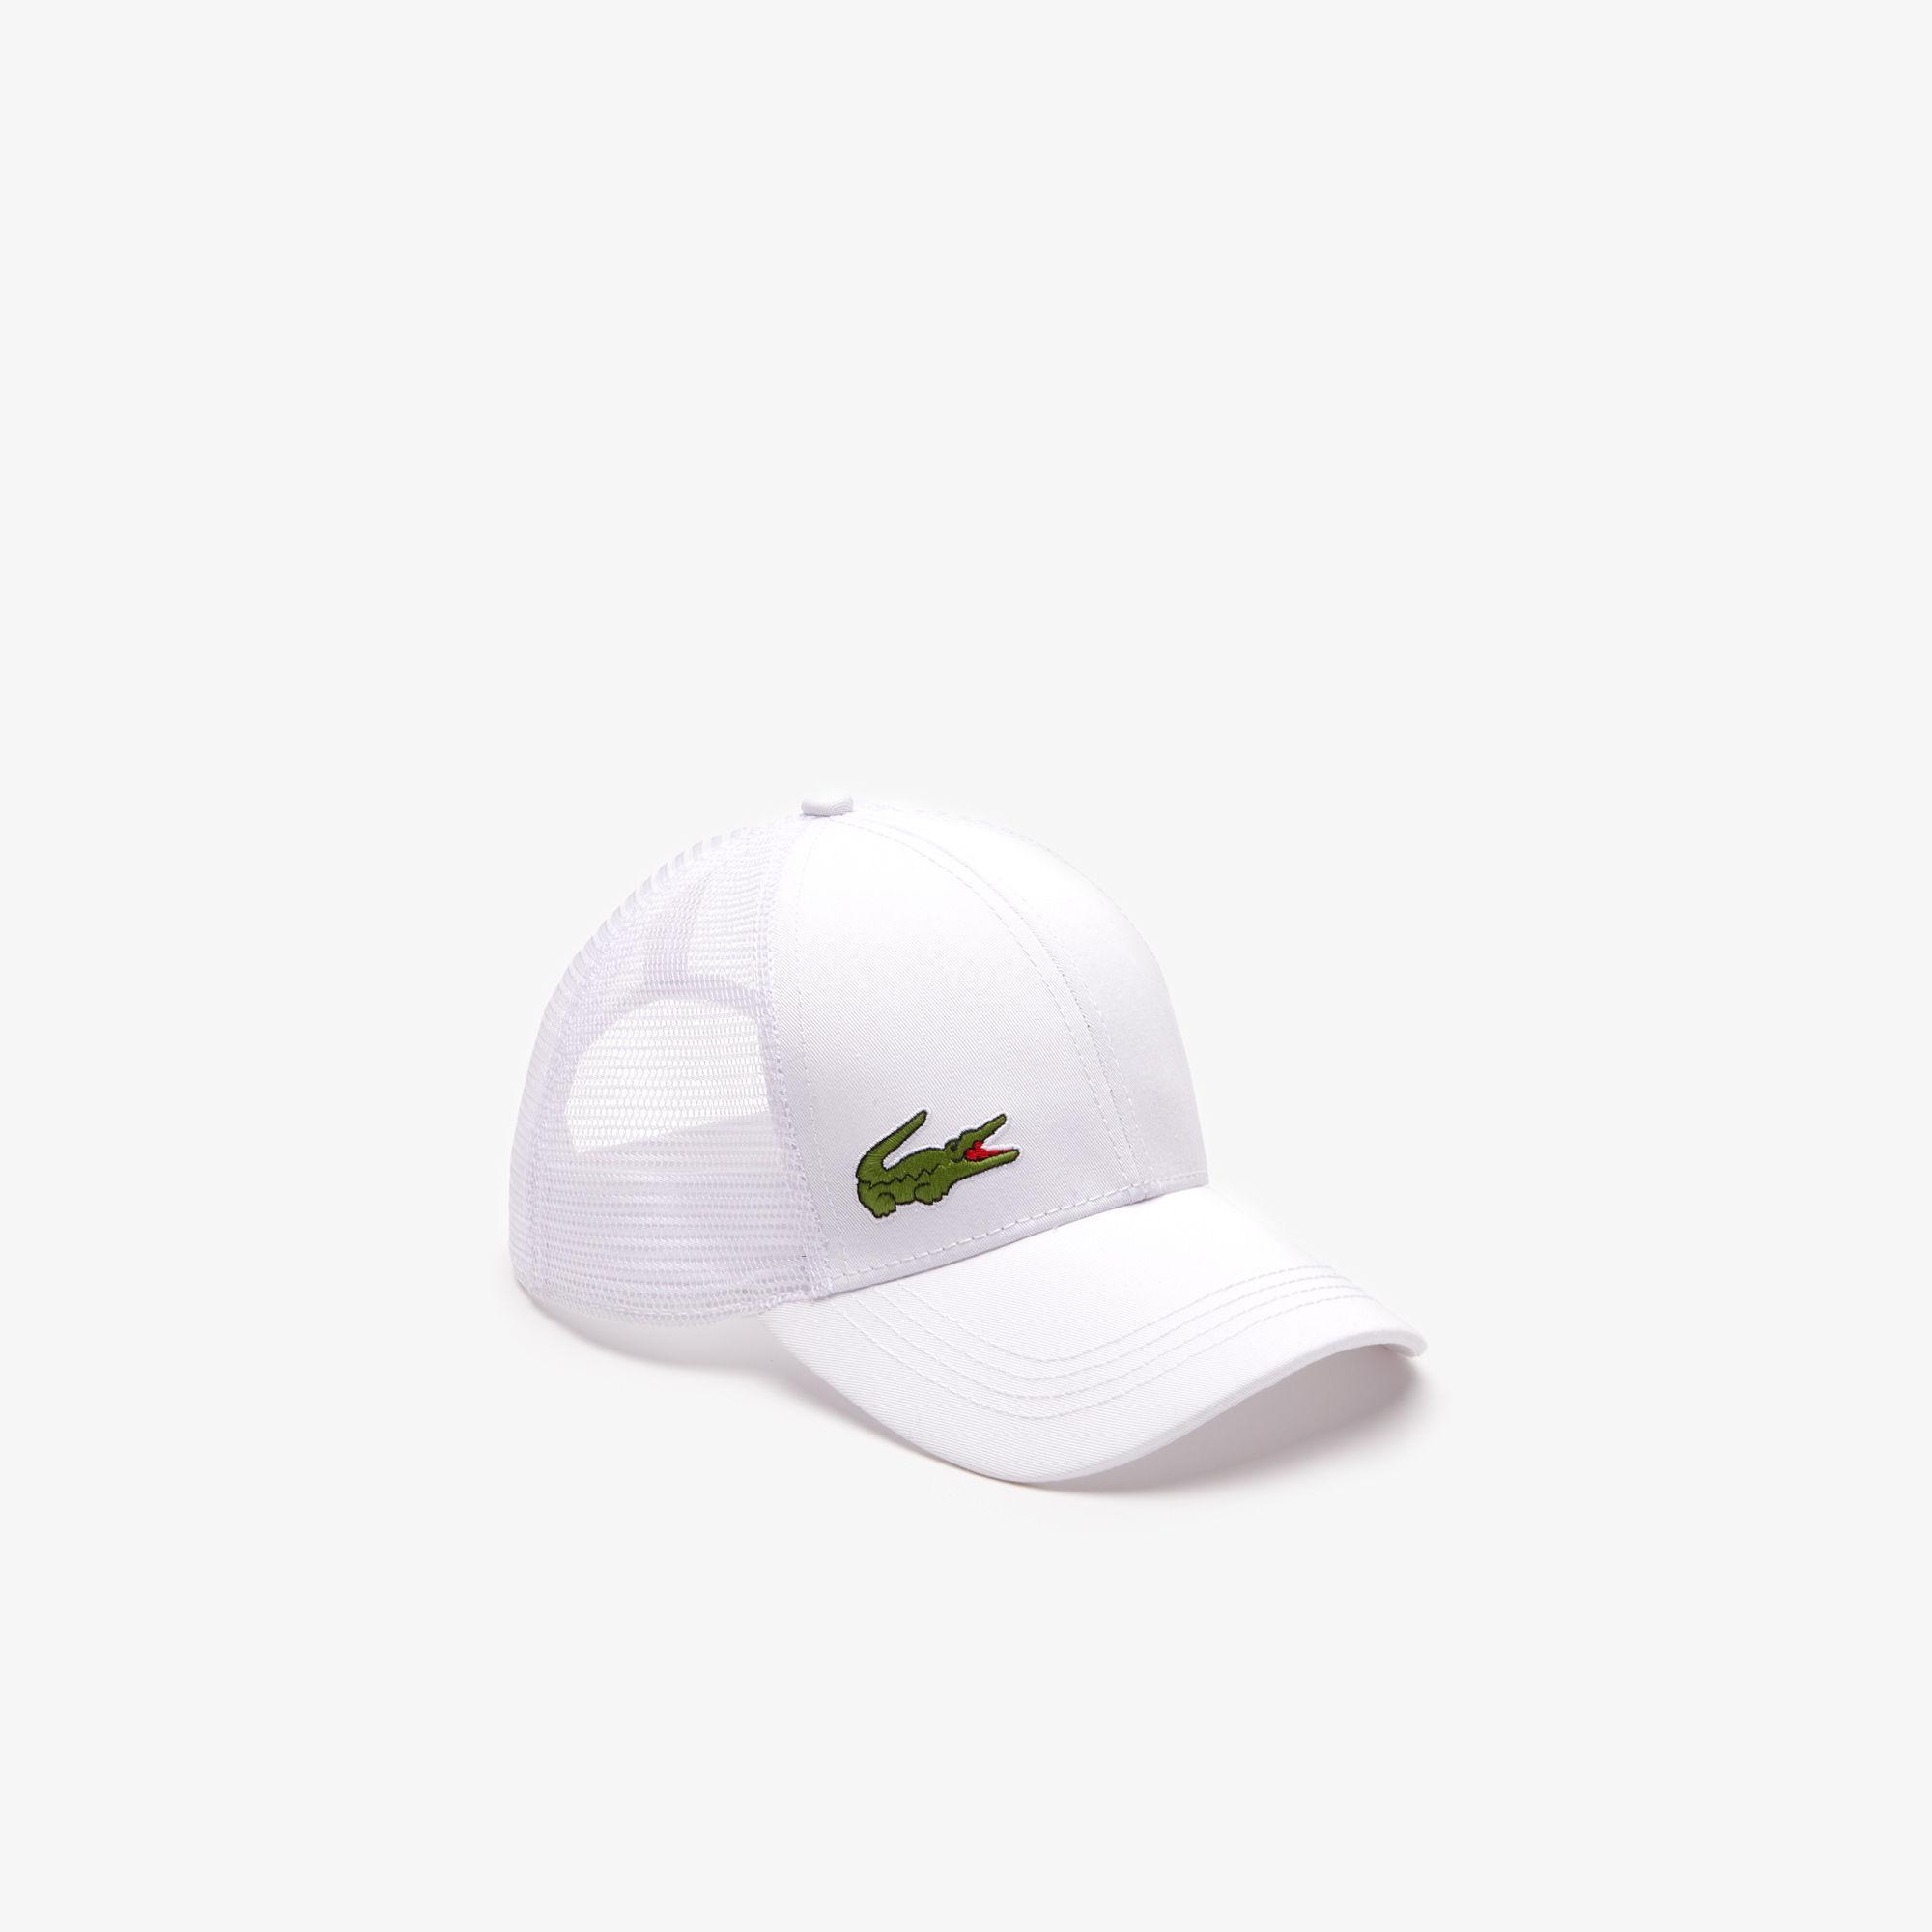 Lyst - Lacoste Sport Gabardine And Mesh Tennis Cap in White for Men e5ac3f37dbc